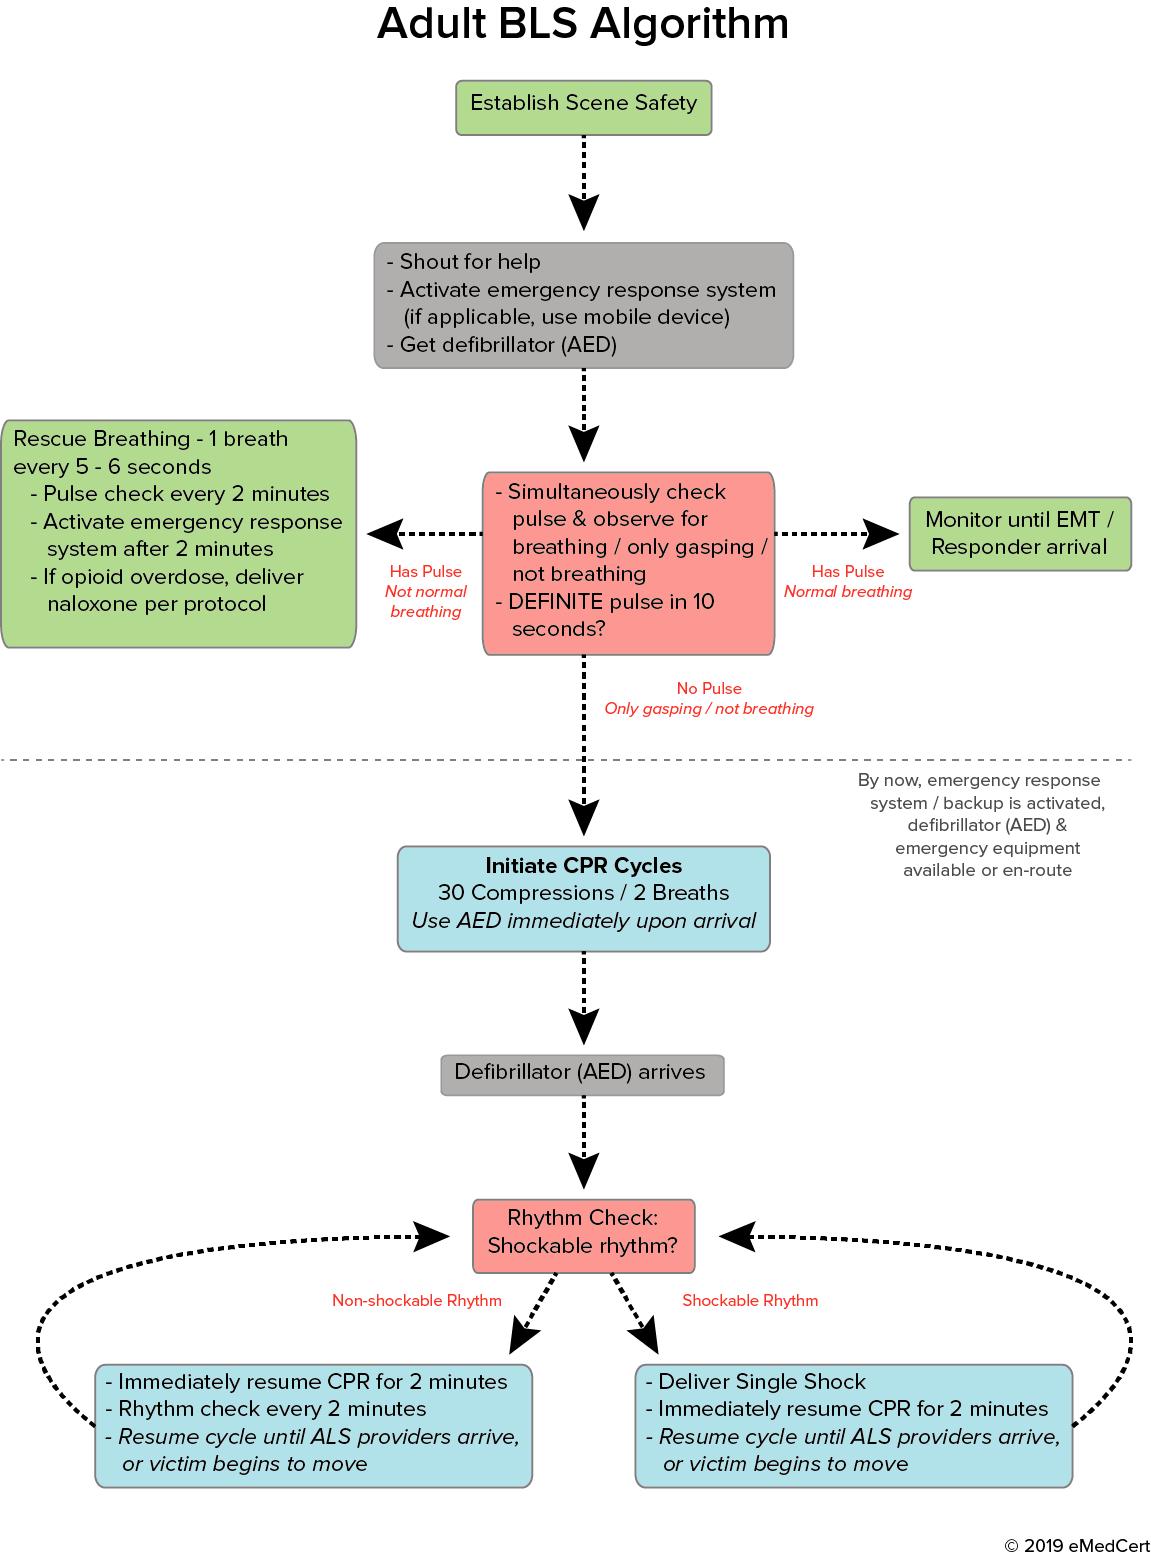 The Ultimate BLS Cheatsheet Acls algorithm, Acls